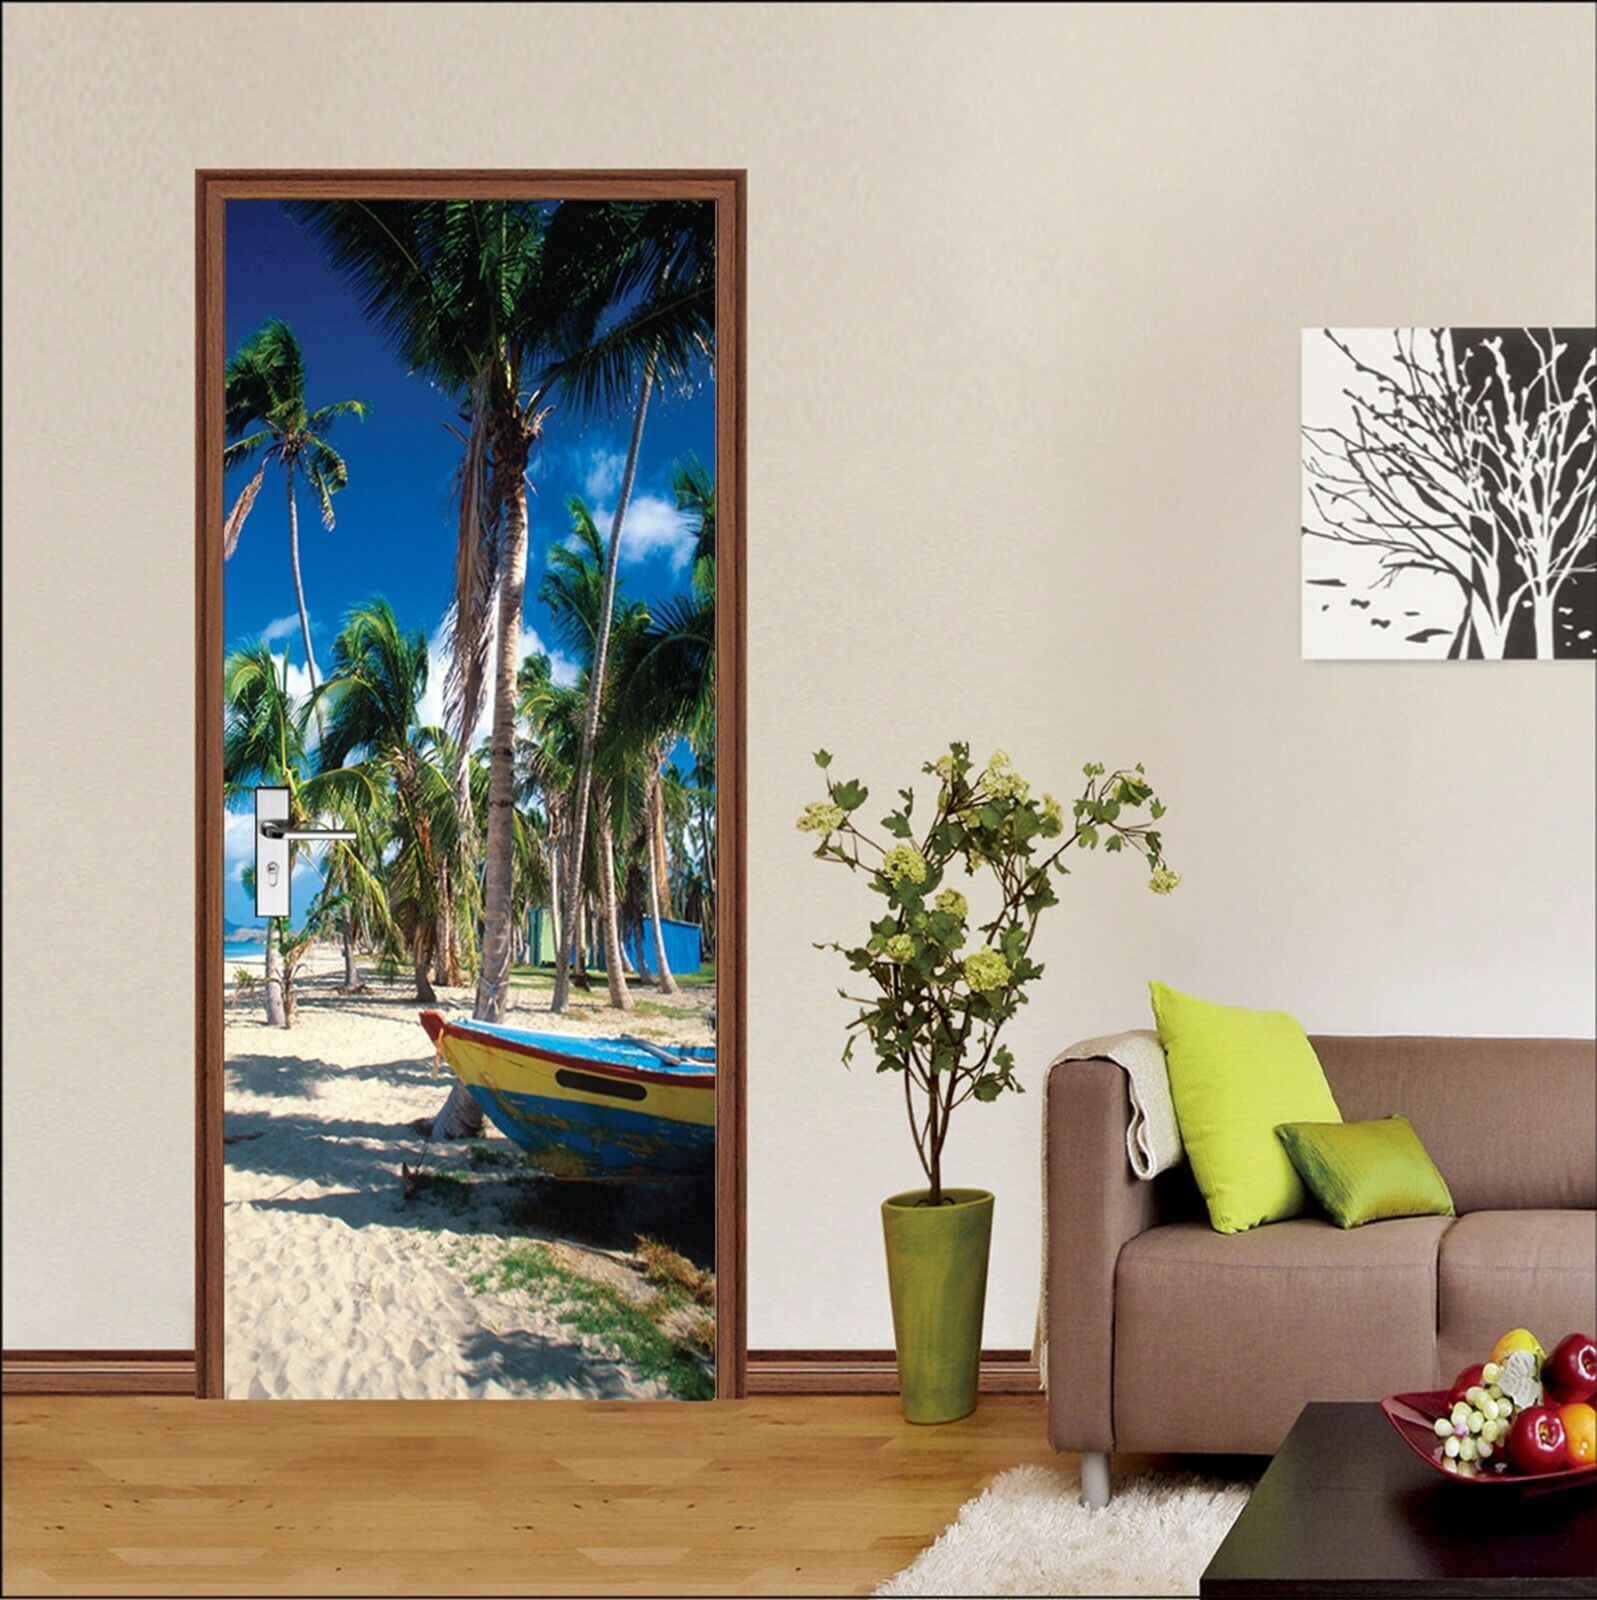 3D Strand 743 Tür Wandmalerei Wandaufkleber Aufkleber AJ WALLPAPER DE Kyra  | Beliebte Empfehlung  | Am praktischsten  | Großer Räumungsverkauf